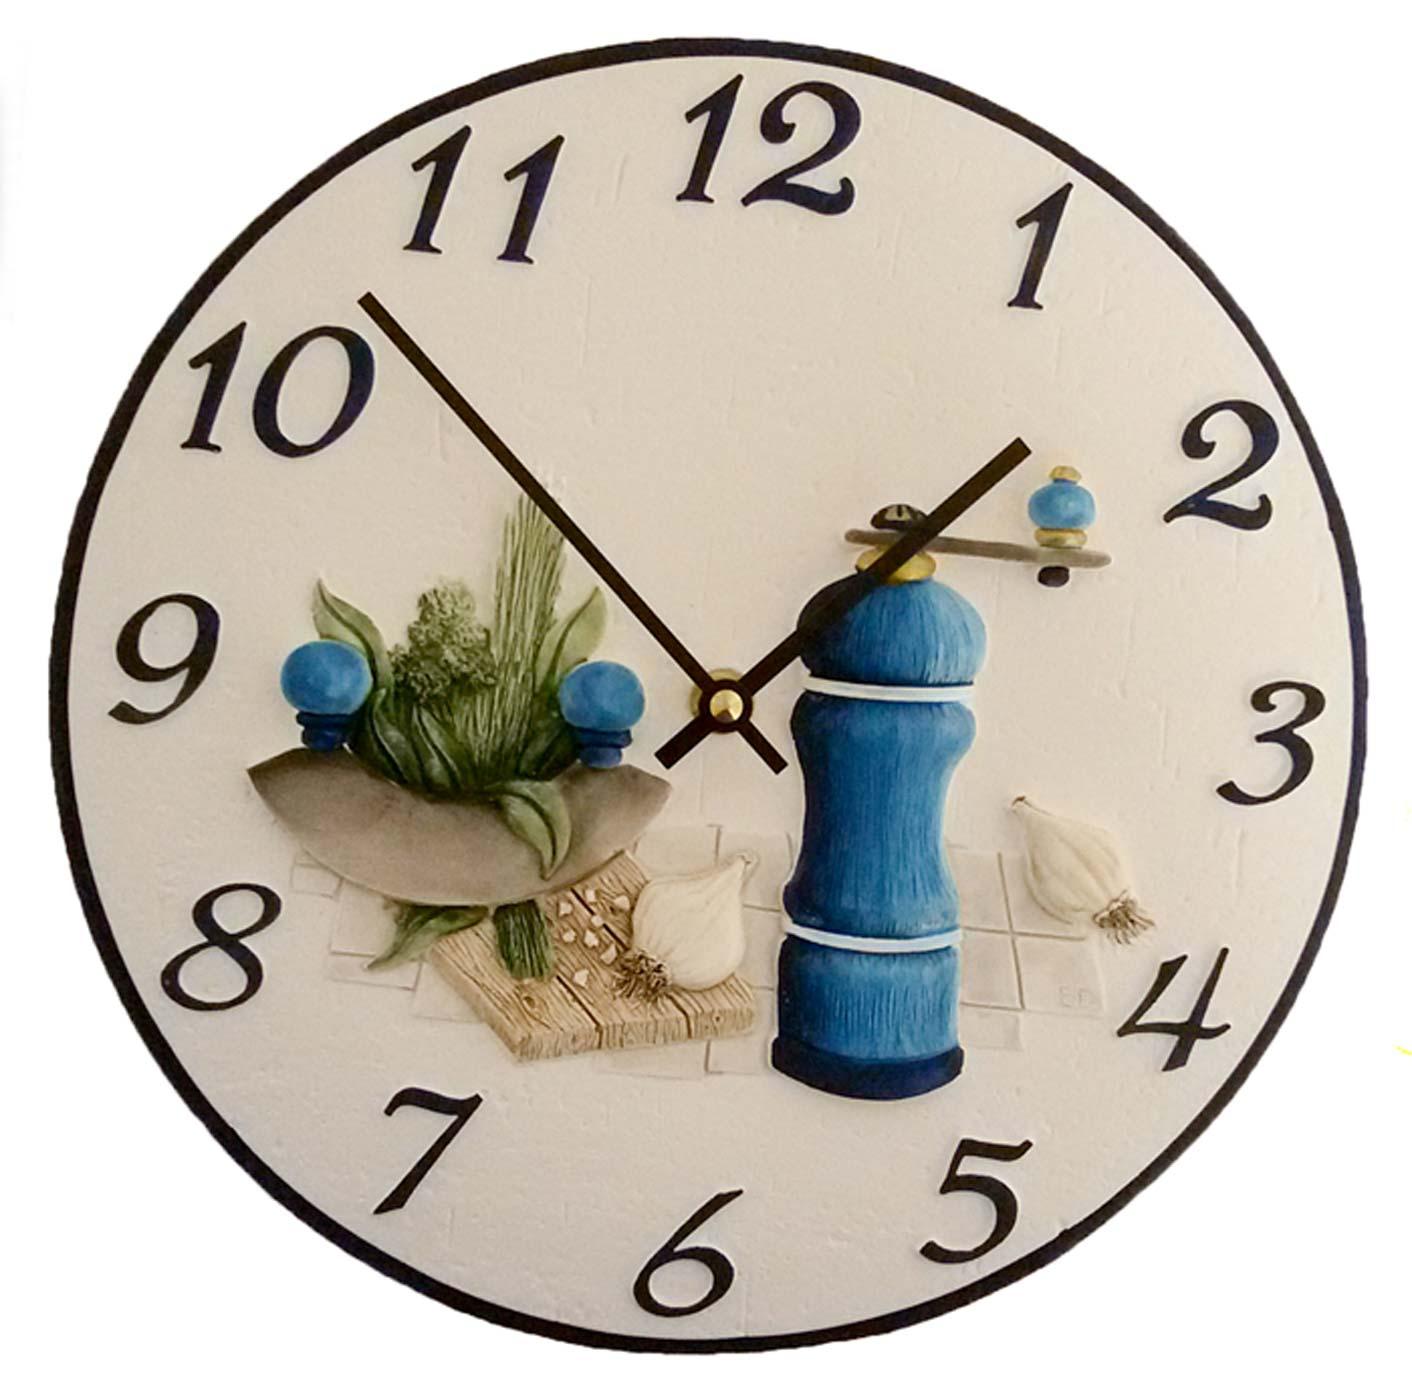 Terrastudio 00 2401 horloge murale horloge de cuisine nouveau ebay - Horloge murale 60 cm ...